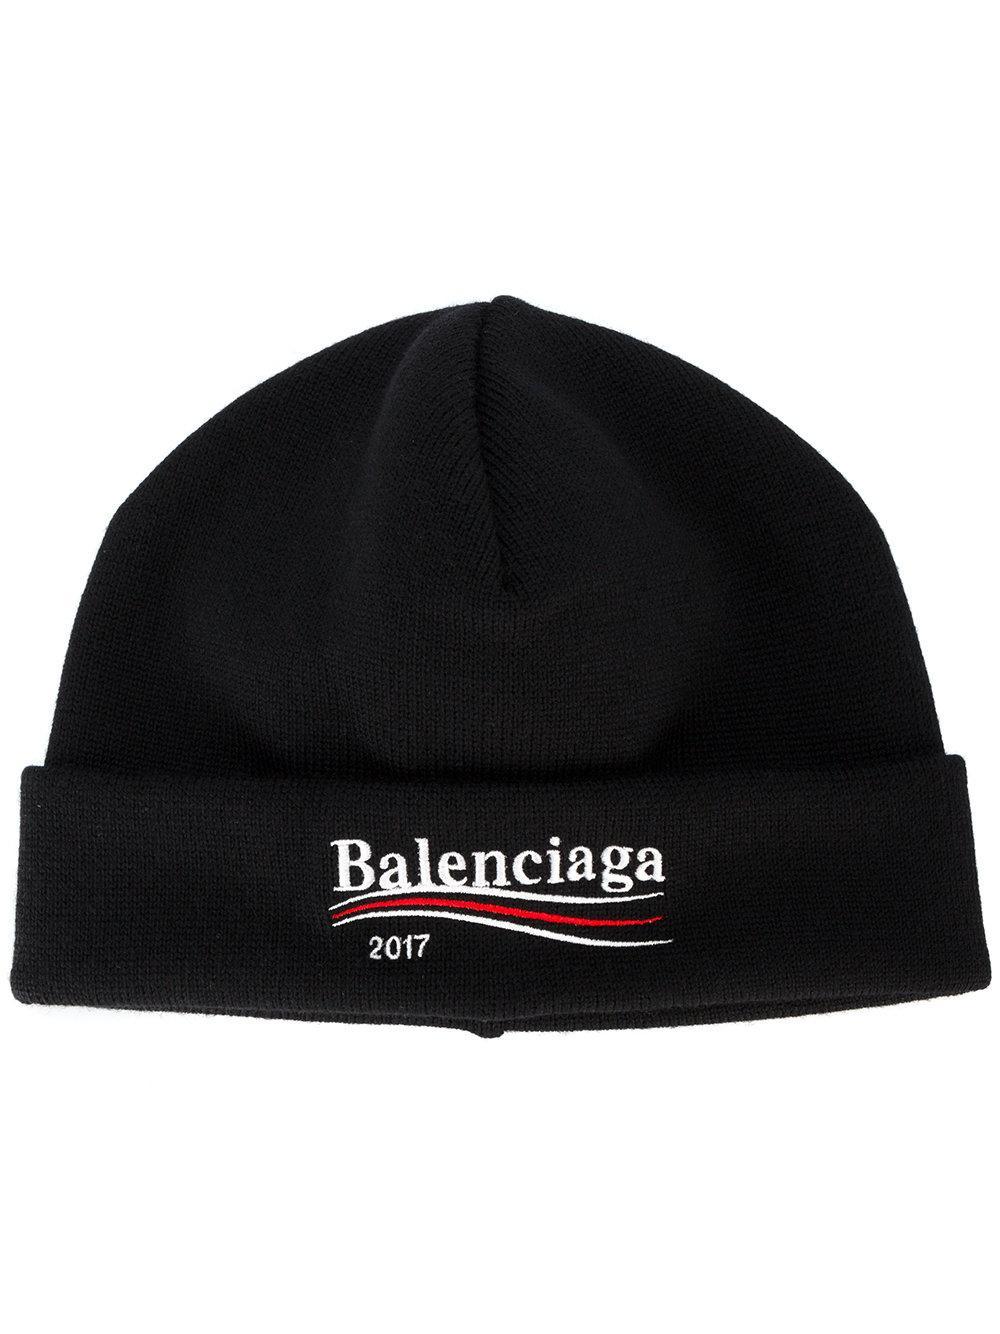 Lyst - Balenciaga 2017 Beanie Hat in Black for Men 6f774cd1c6e9